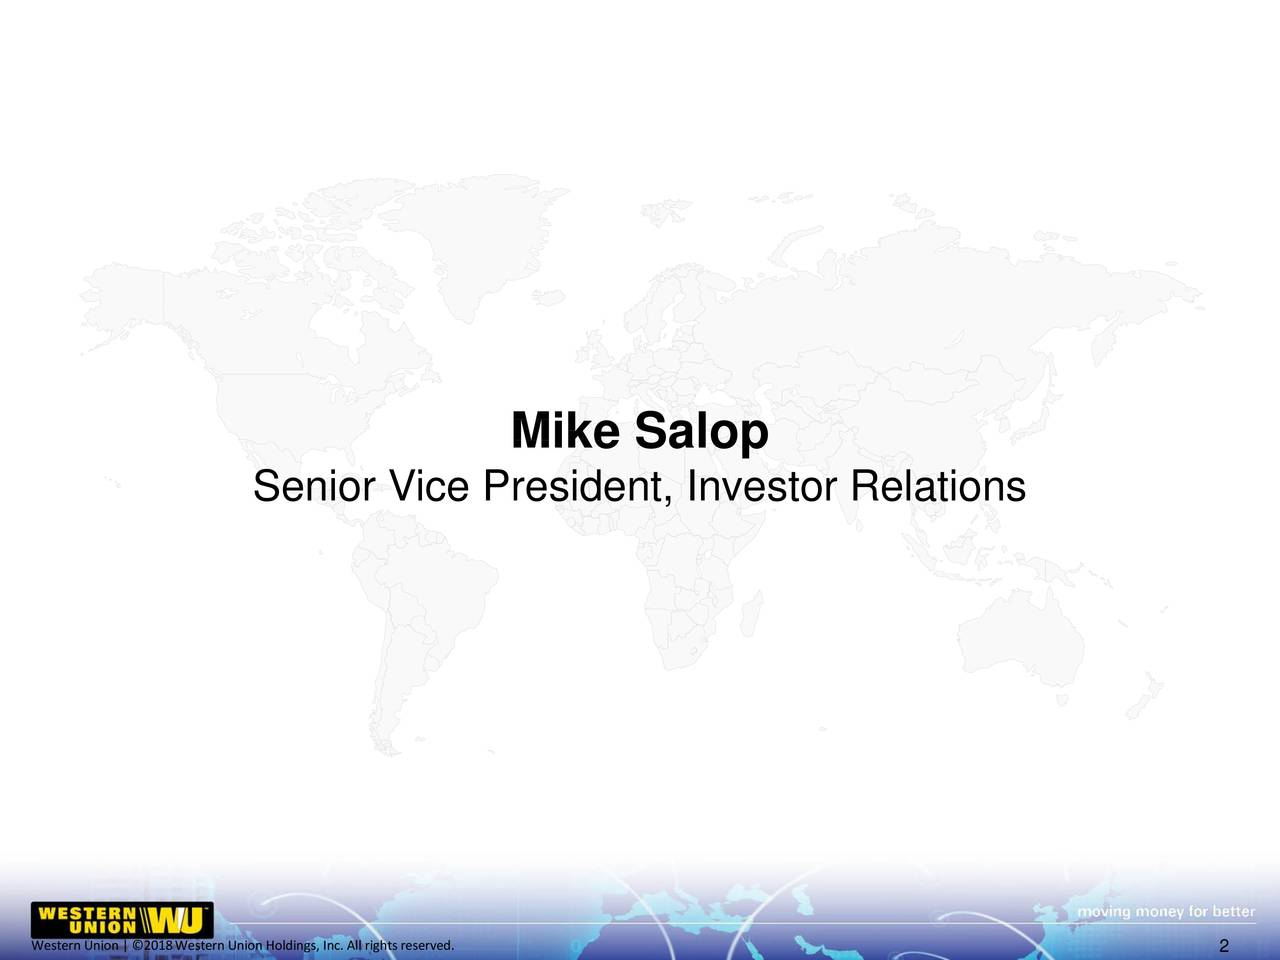 Senior Vice President, Investor Relations